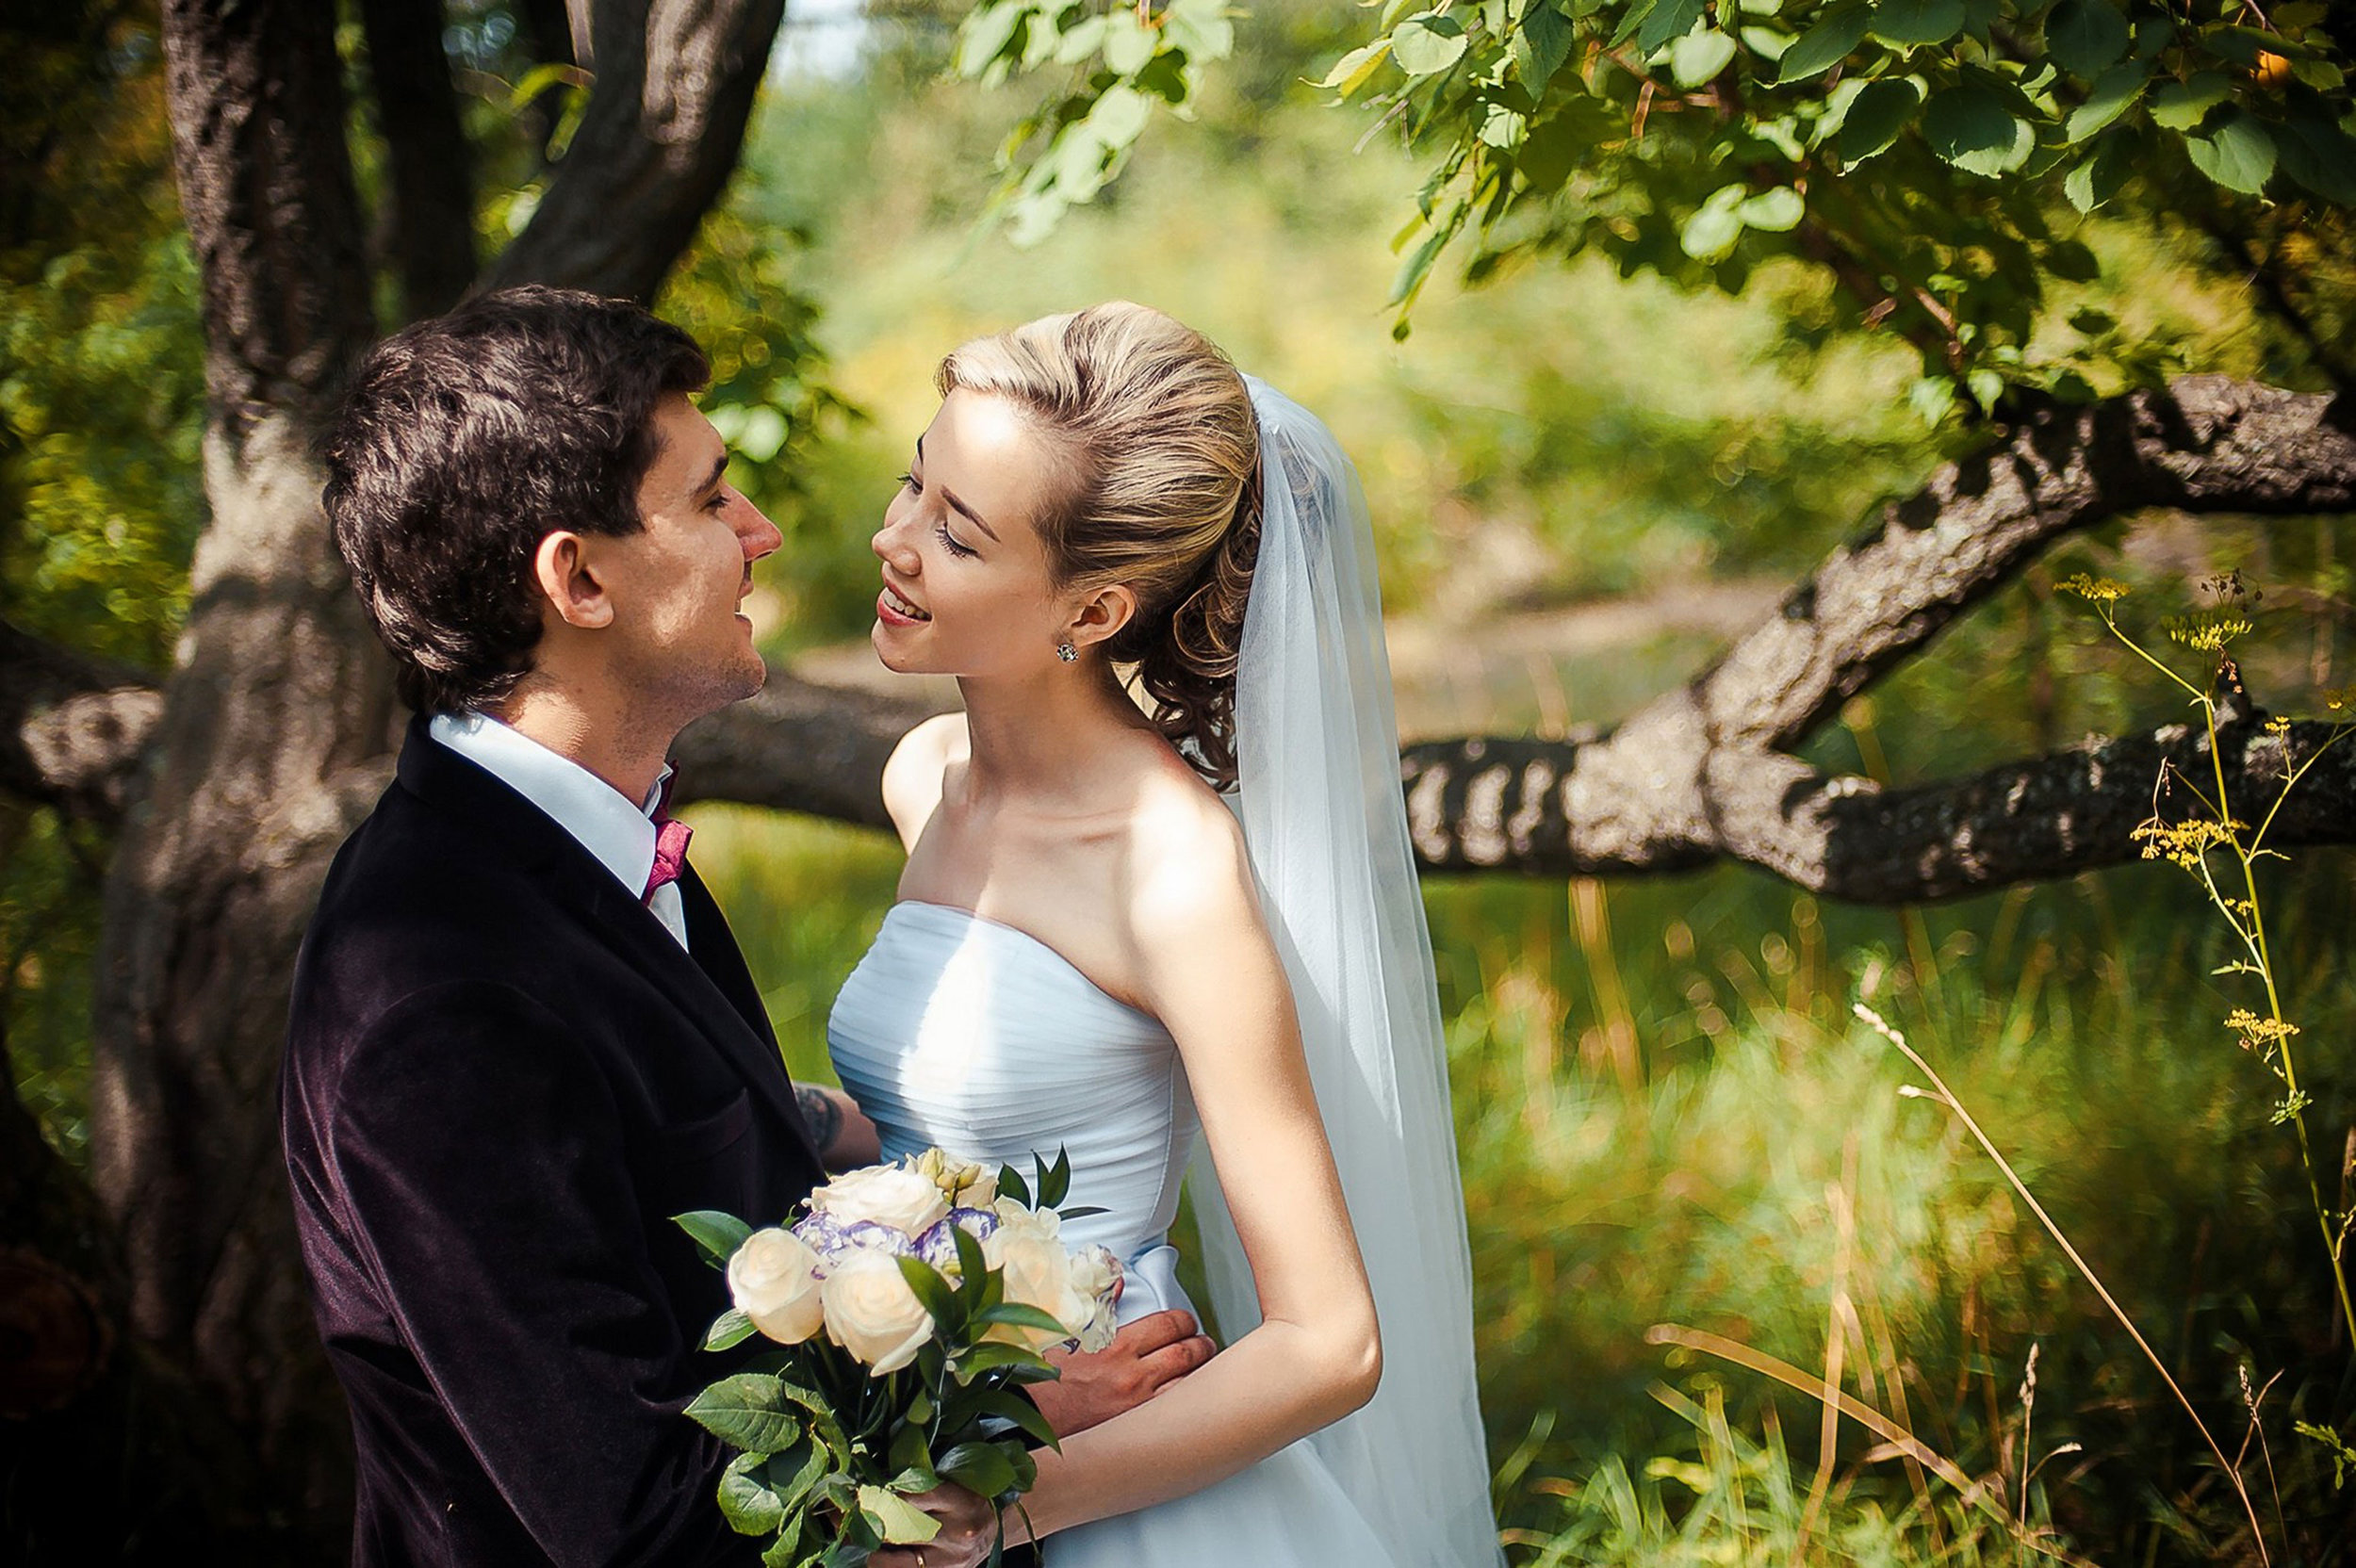 wedding_couple_bush.jpg